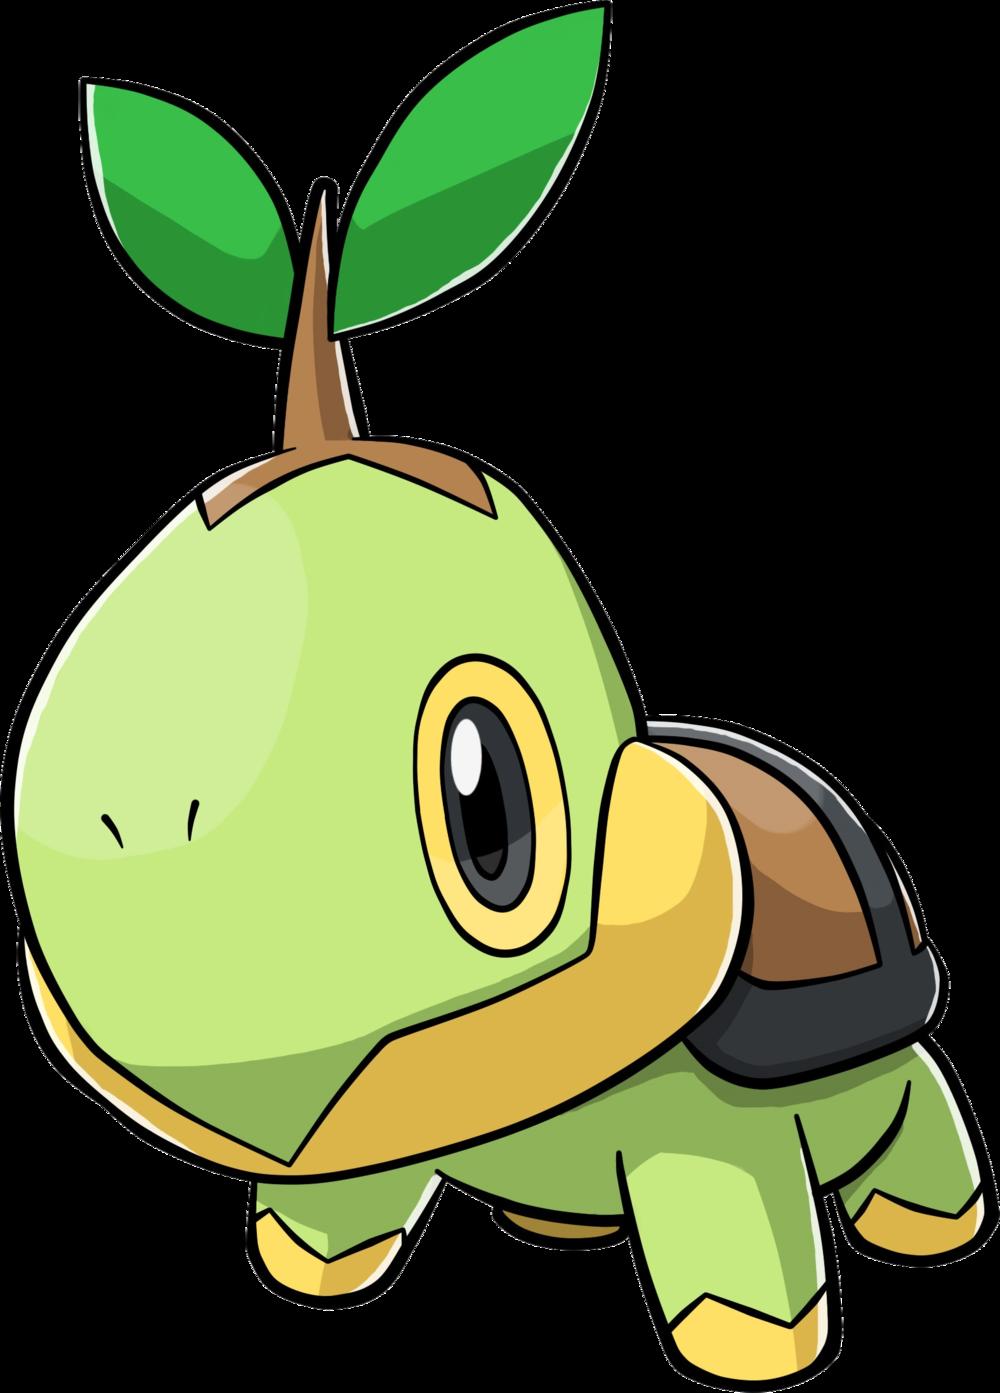 Turtwig Pokemon Wiki Fandom Powered By Wikia In 2020 Pokemon Mewtwo Cute Pokemon Wallpaper Pokemon